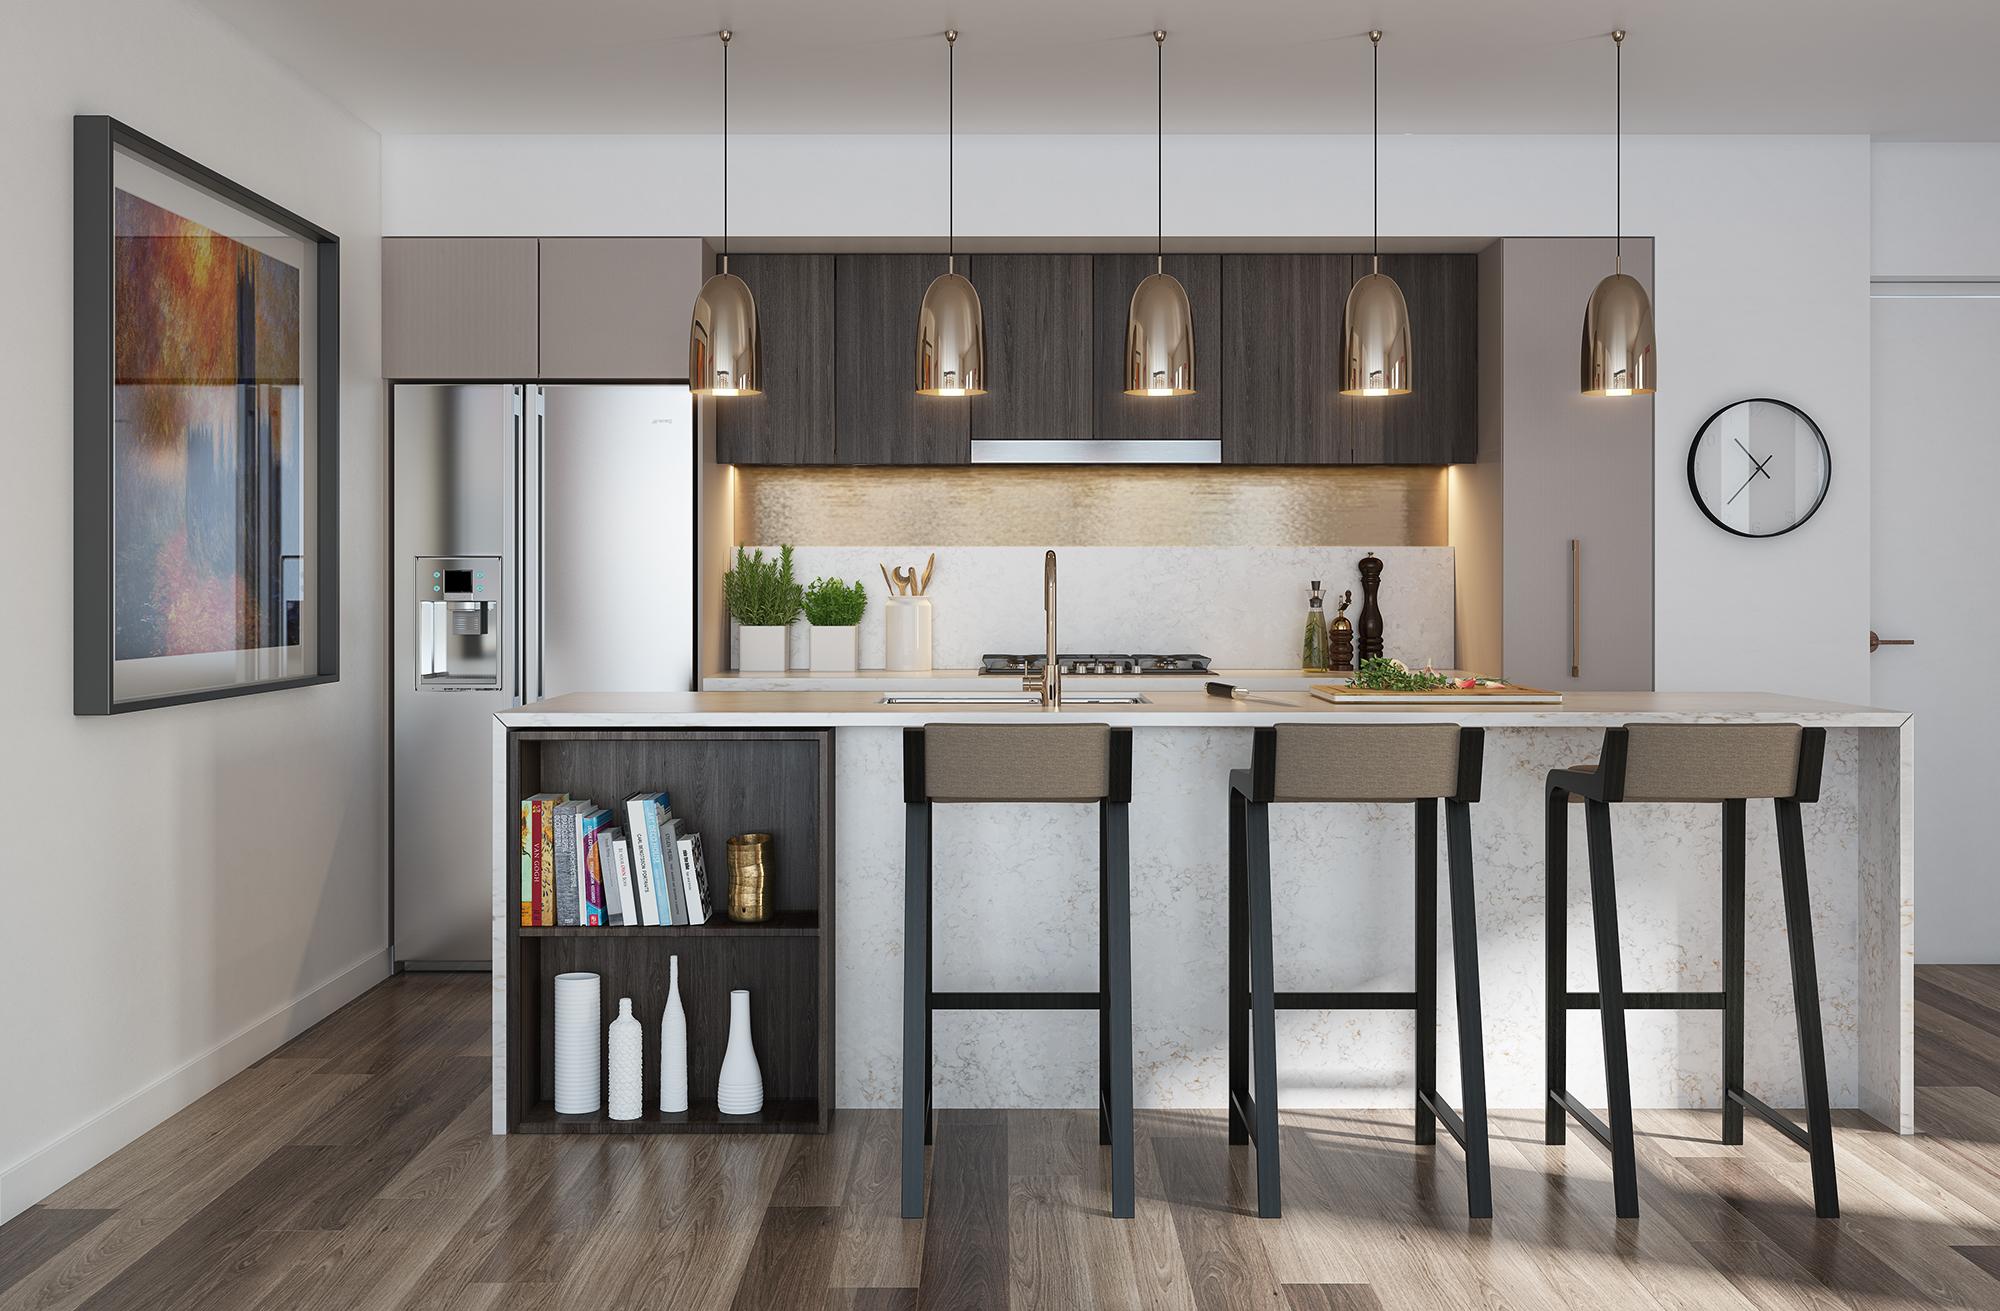 150717-markwell-kitchen-final-2000